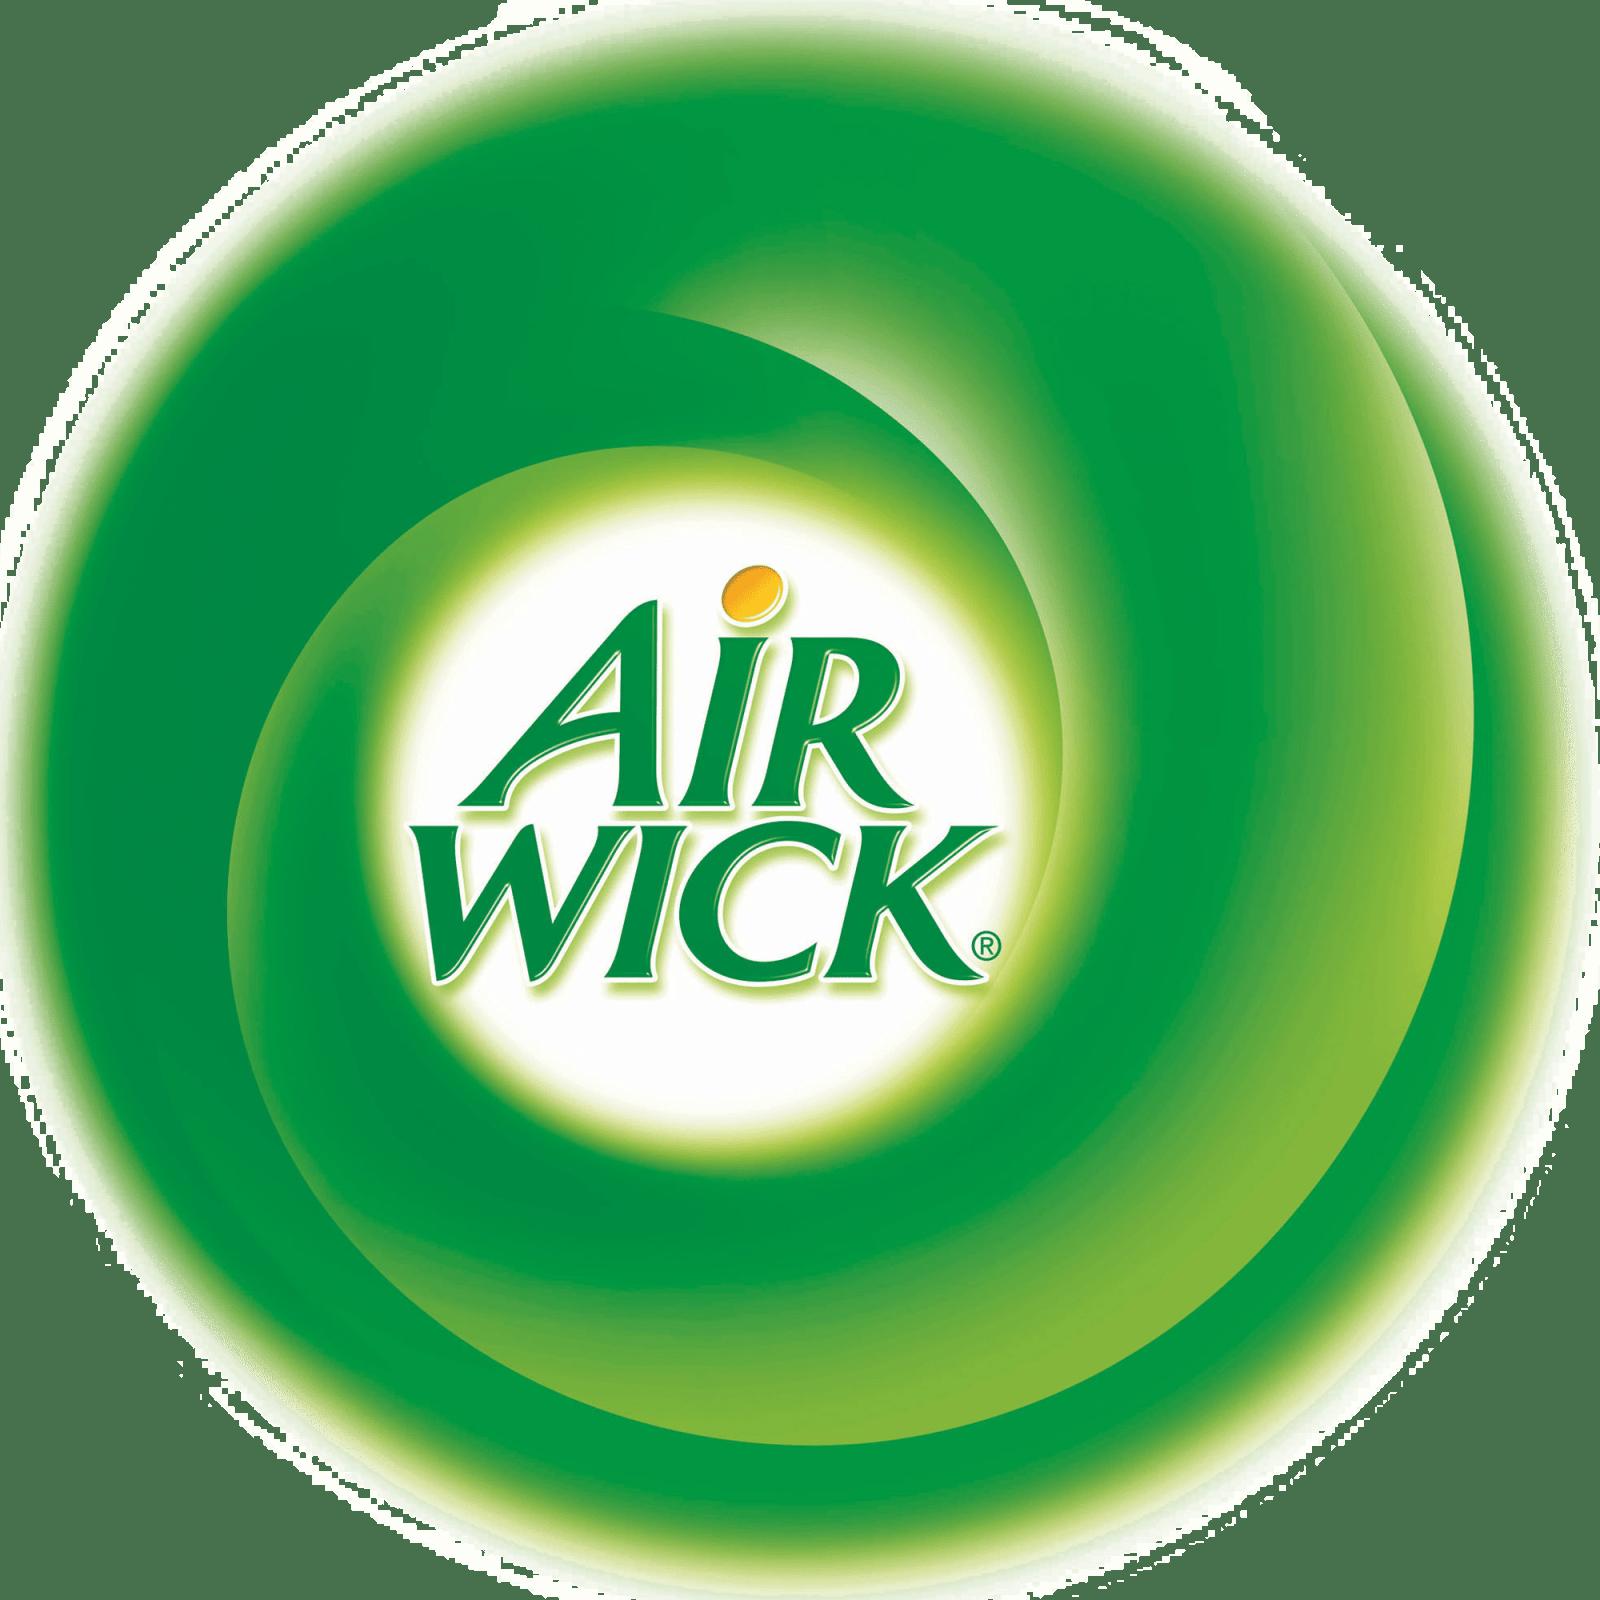 Air_Wick_logo